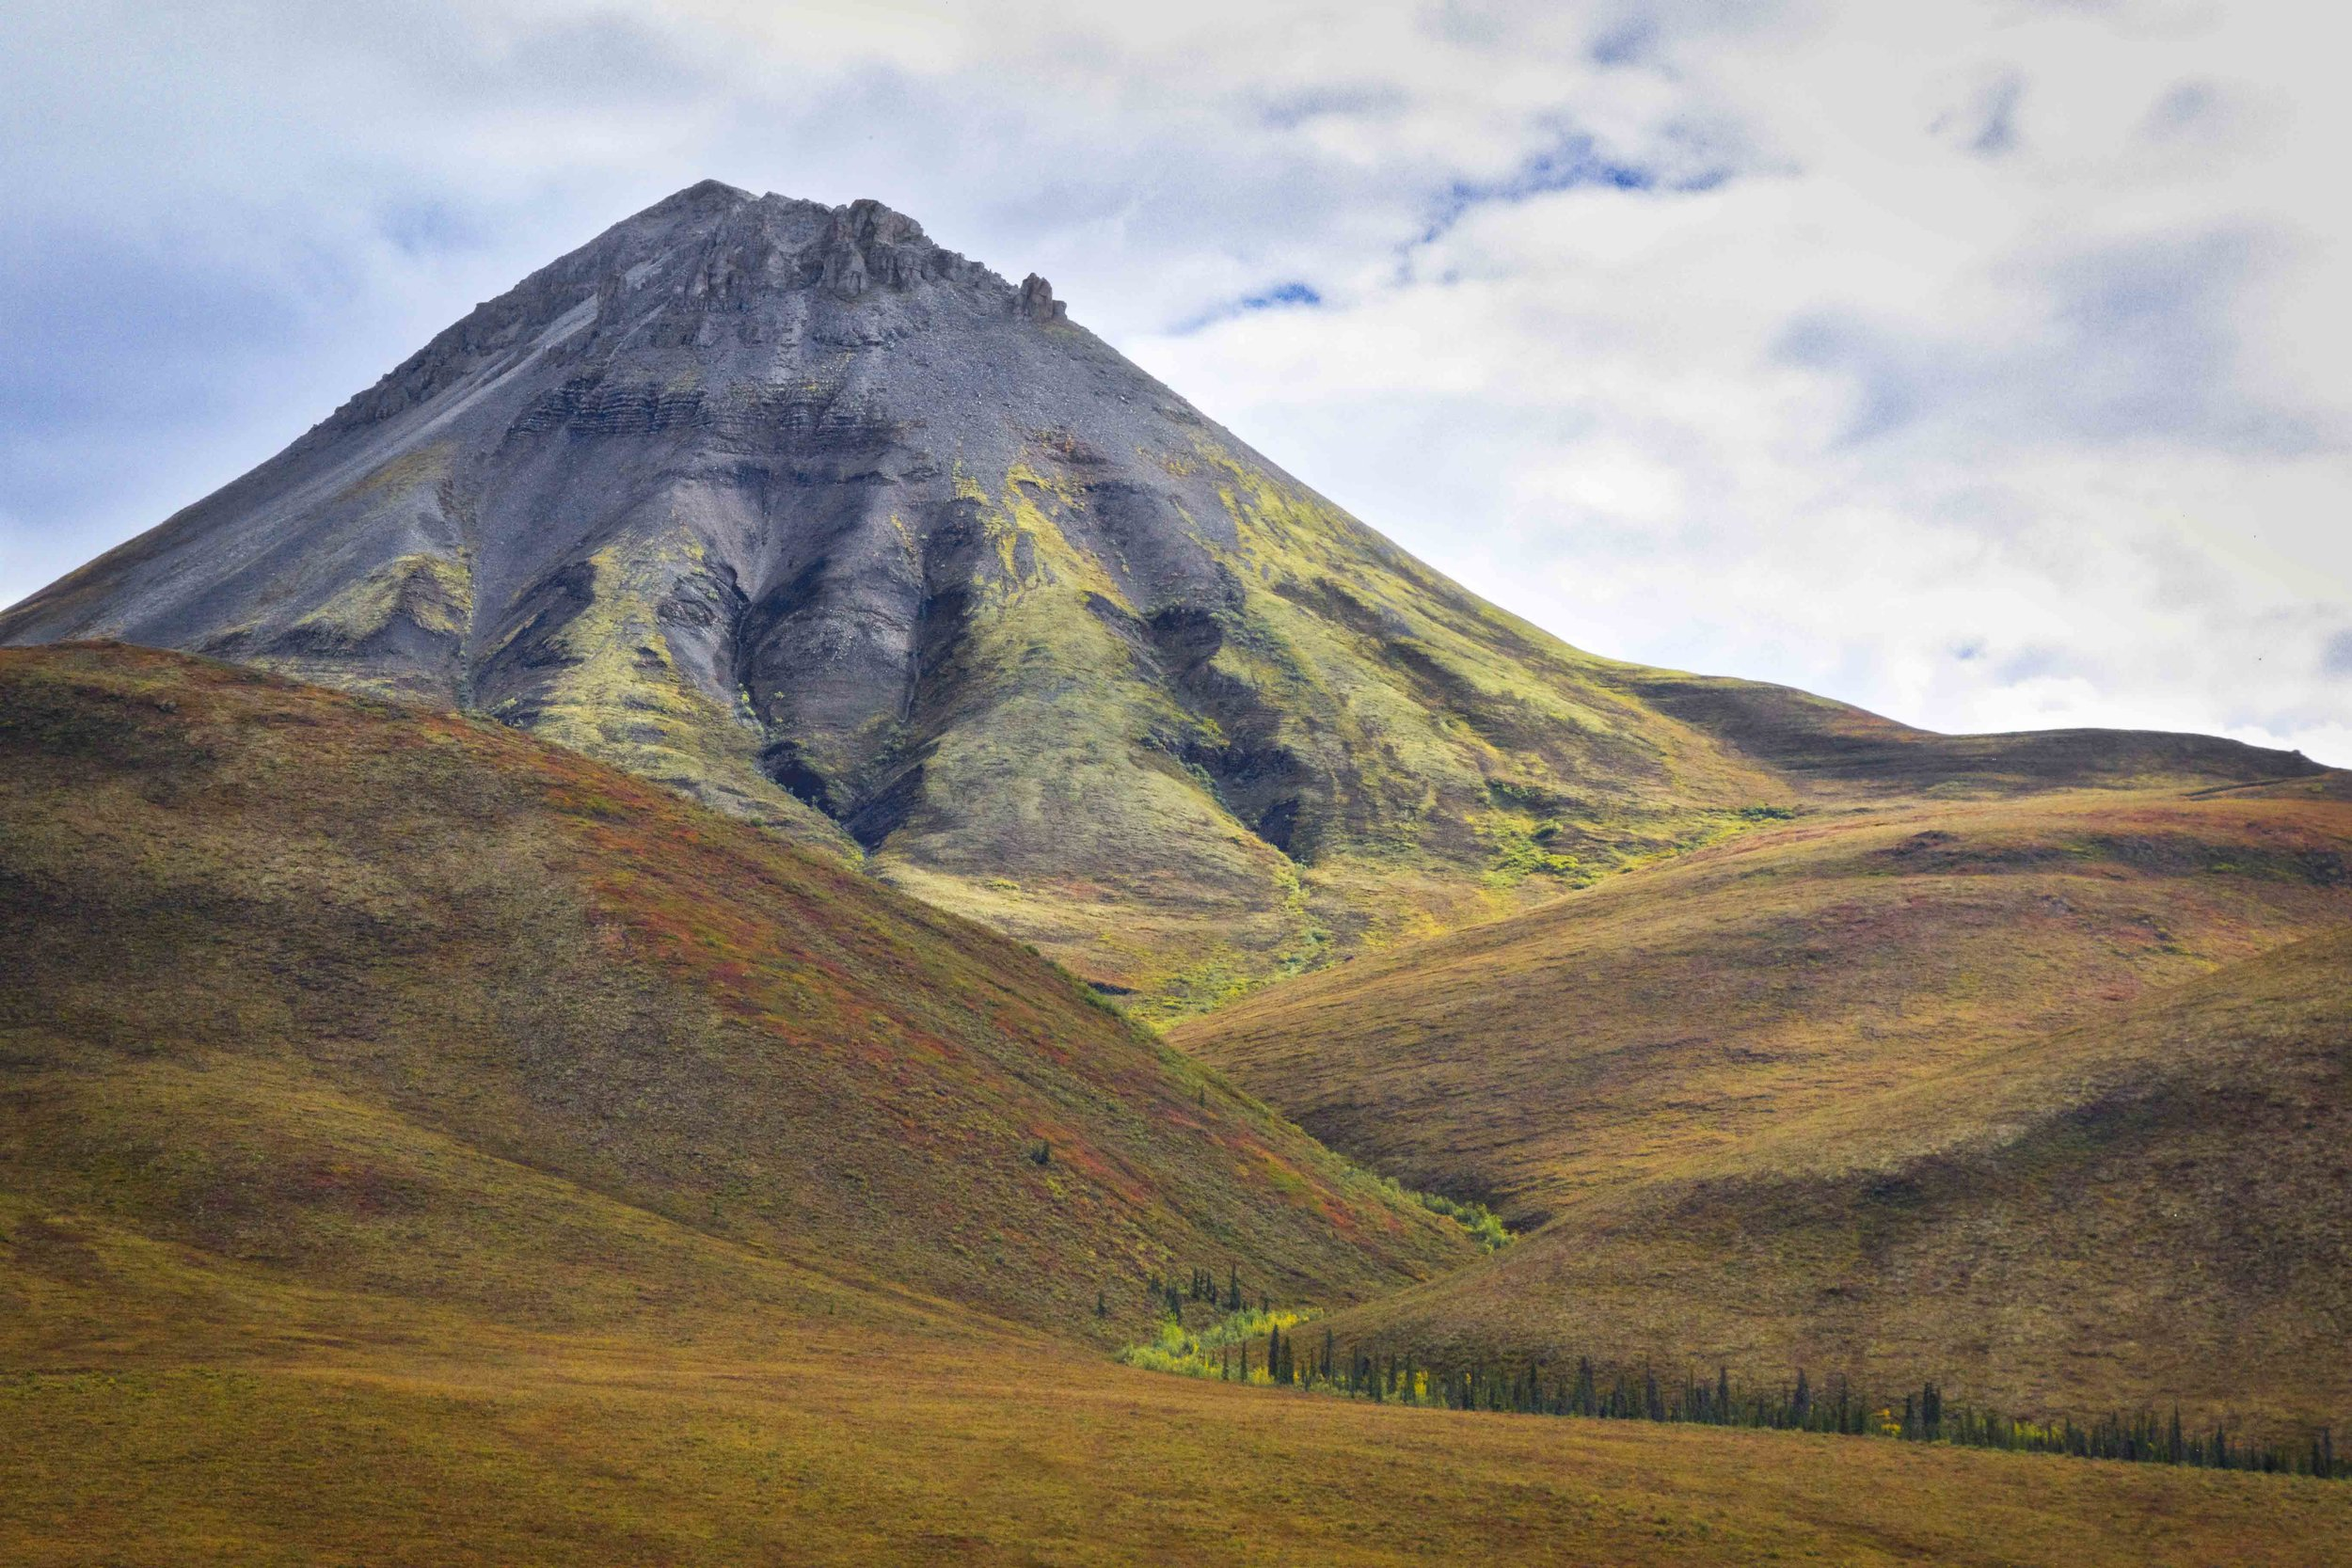 Dempster Highway, Roadtrip, Landscape, Arctic, rob gubiani, Tundra, Tombstone, Tuktoyuktuk, Inuvik, Dempster, Yukon, travel, wanderlust, boreal, forest, boreal forest, fall, autumn, mountain,